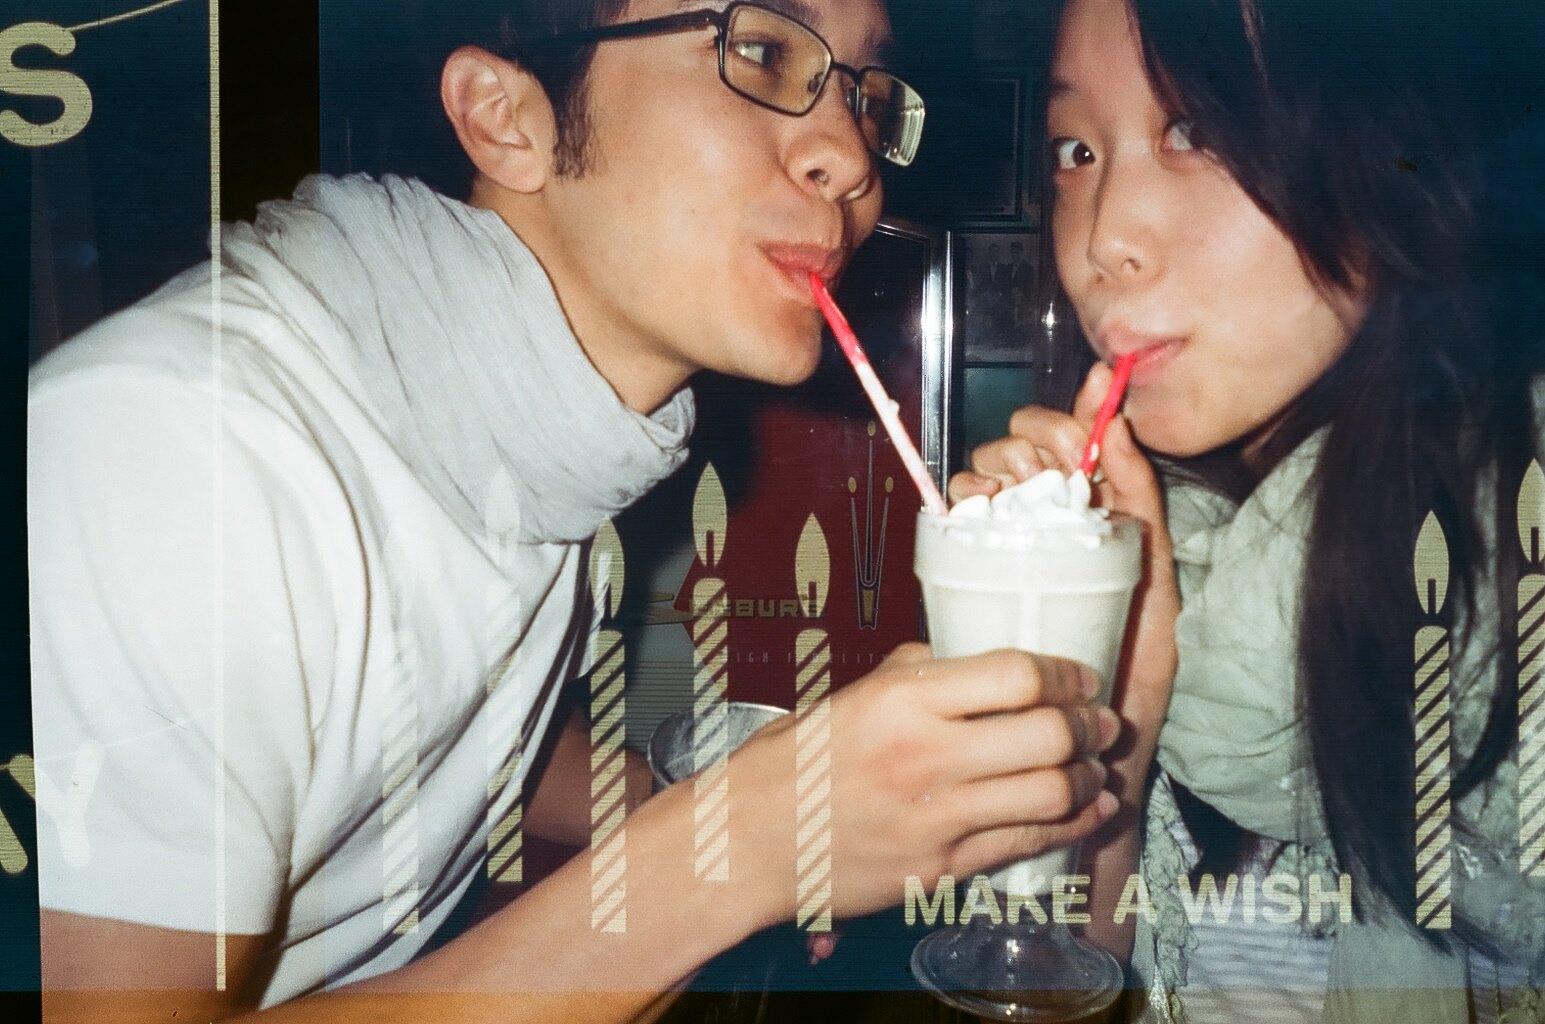 Milkshakes on Eric's birthday (themed disposable camera), 2014